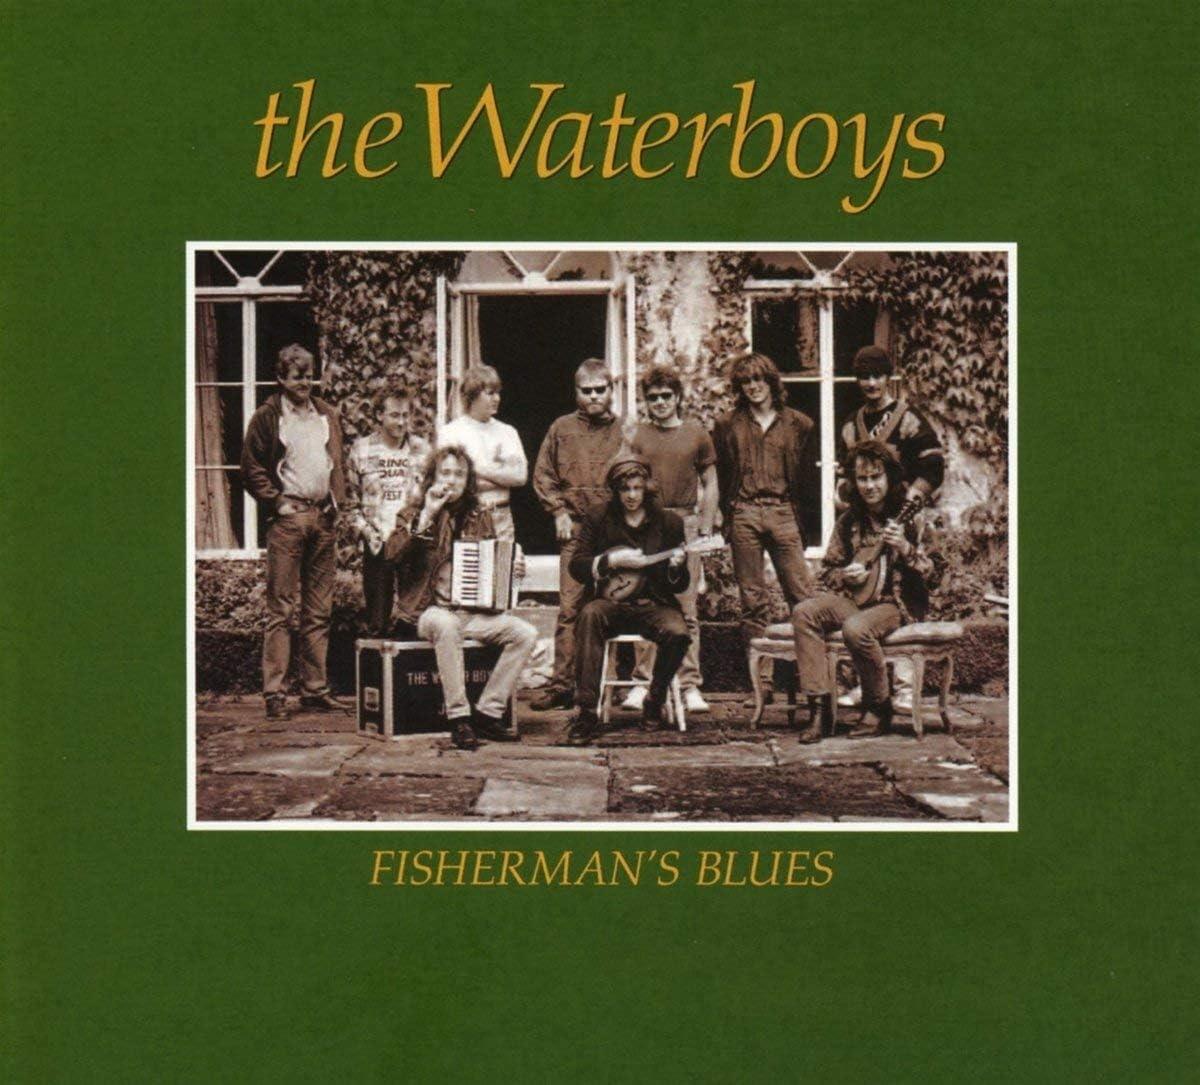 Fisherman's Blues: Amazon.co.uk: Music